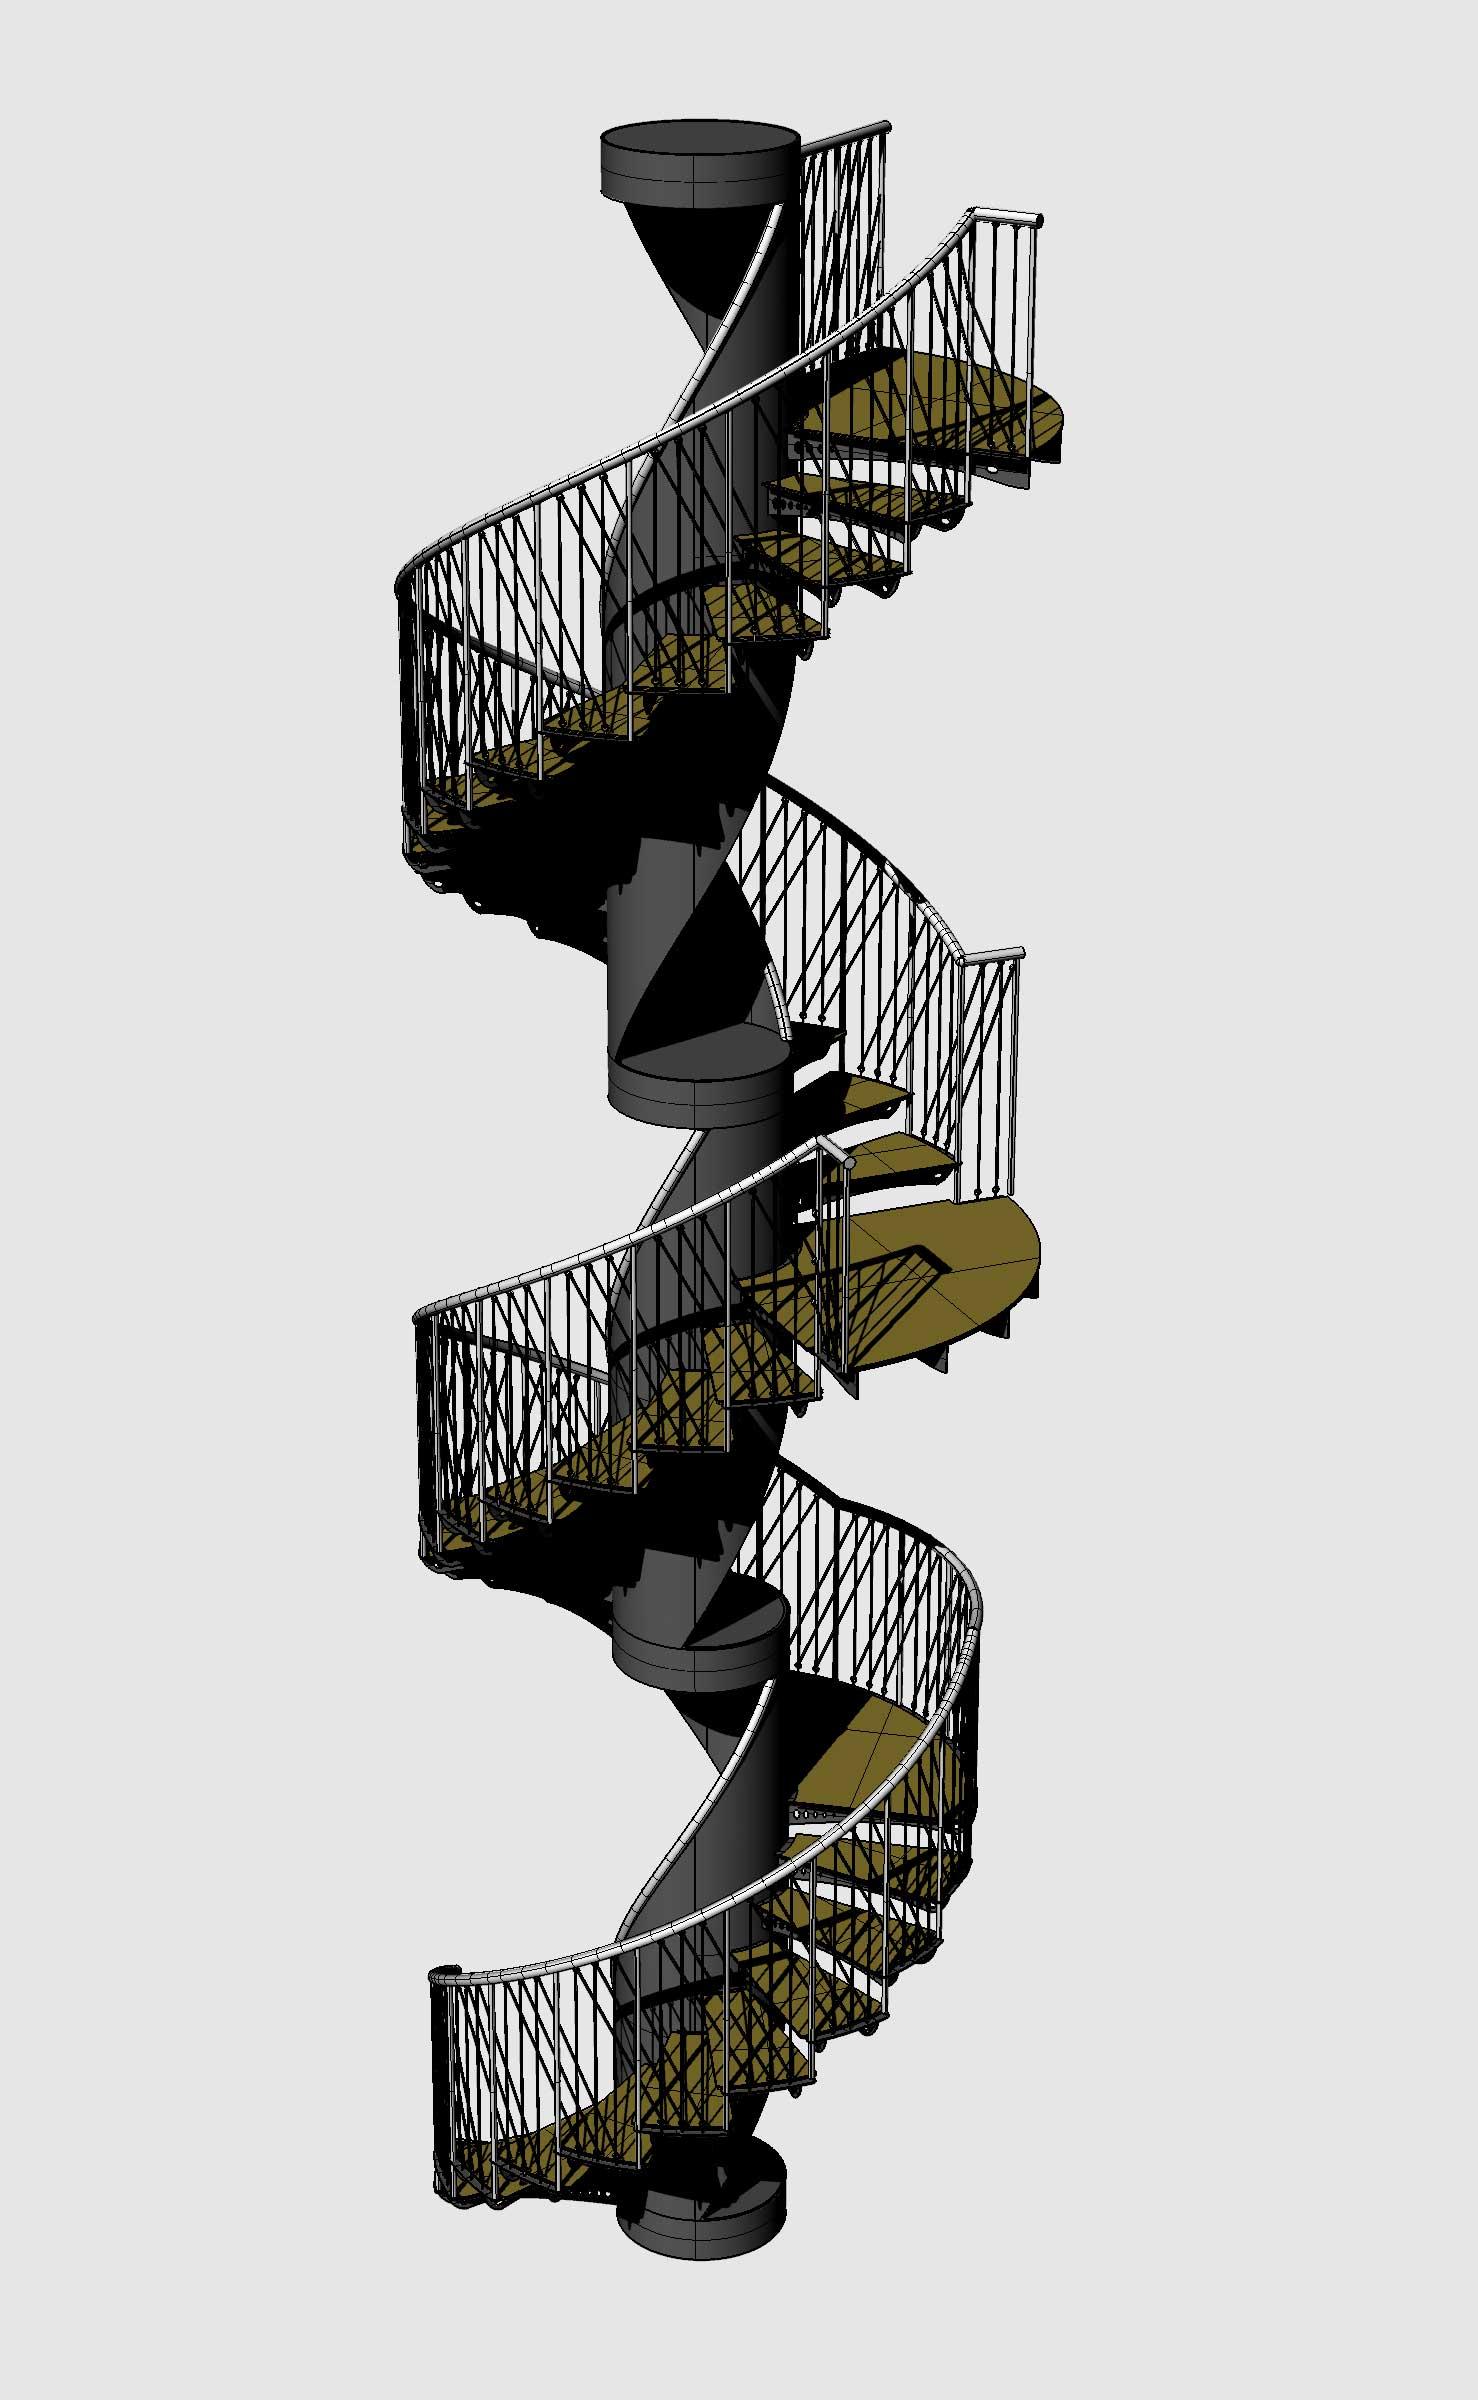 Initial Rendering of Spiral Stair